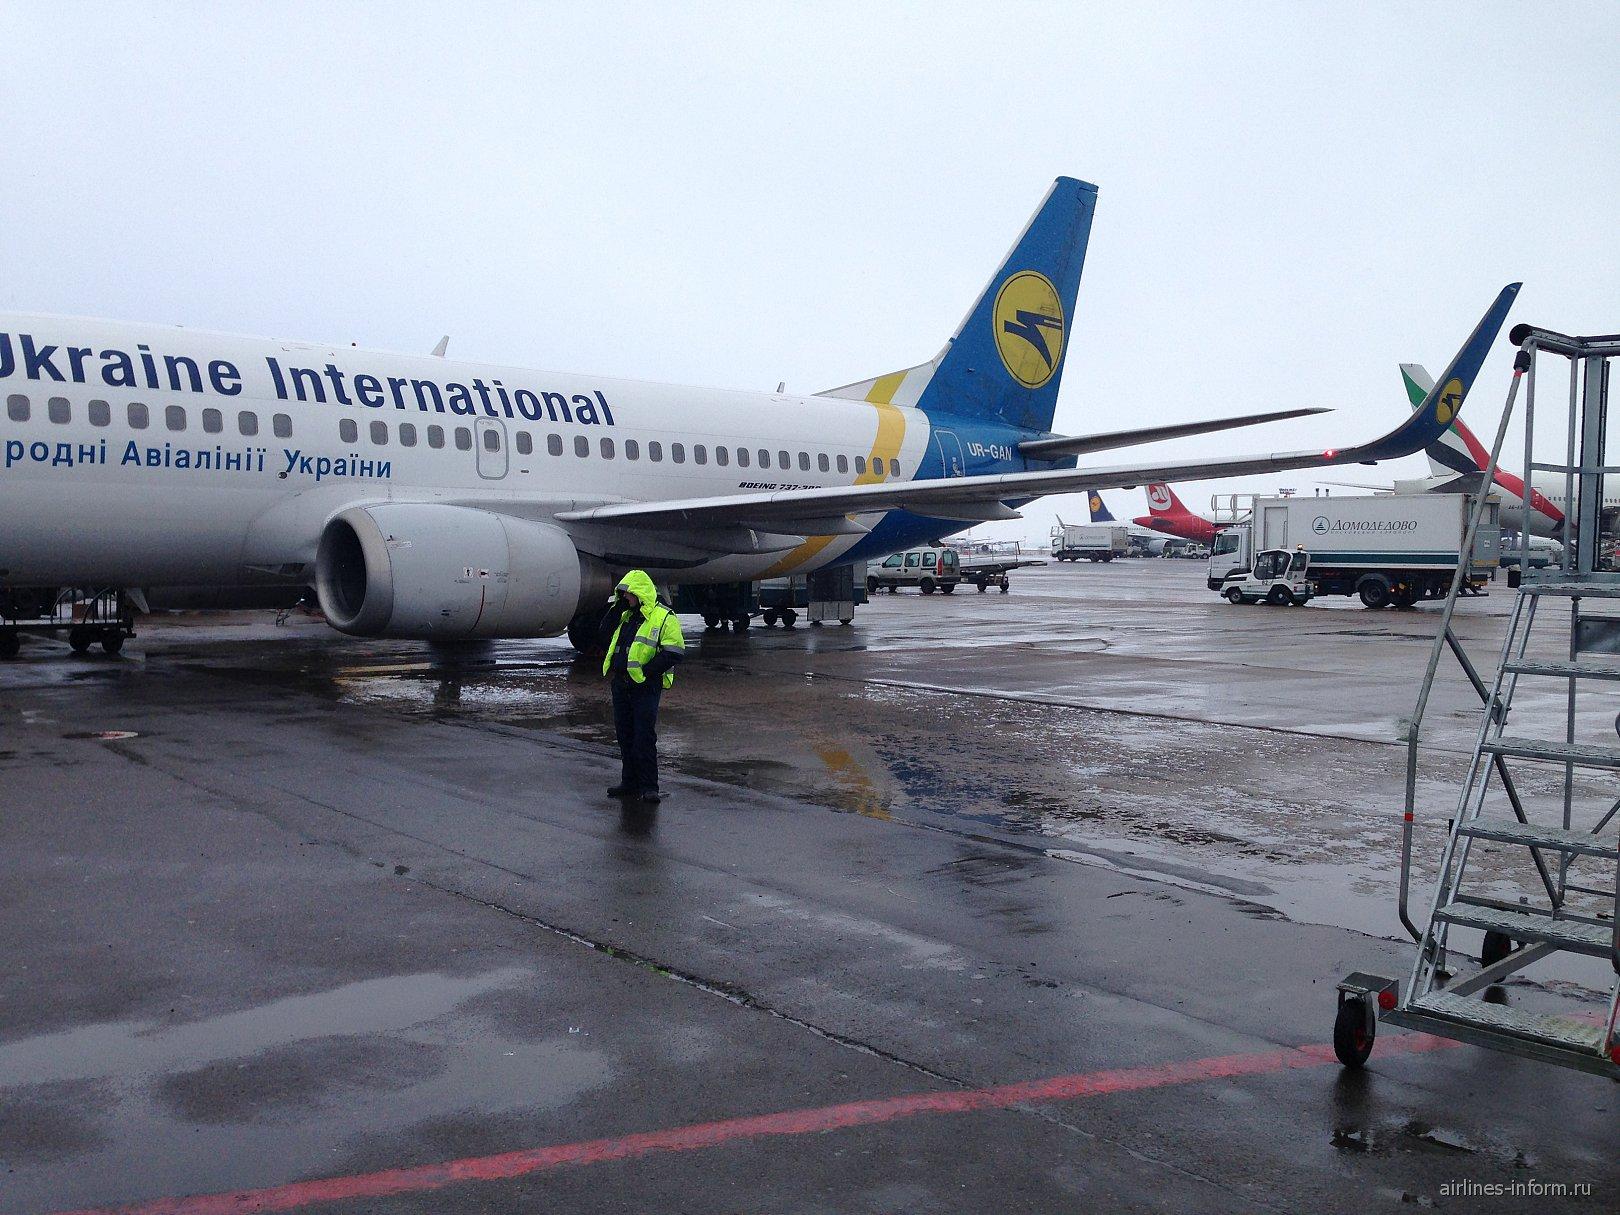 Галопом по стлицам! TSE→DME via KBP с Ukraine International Airlines. Часть 2